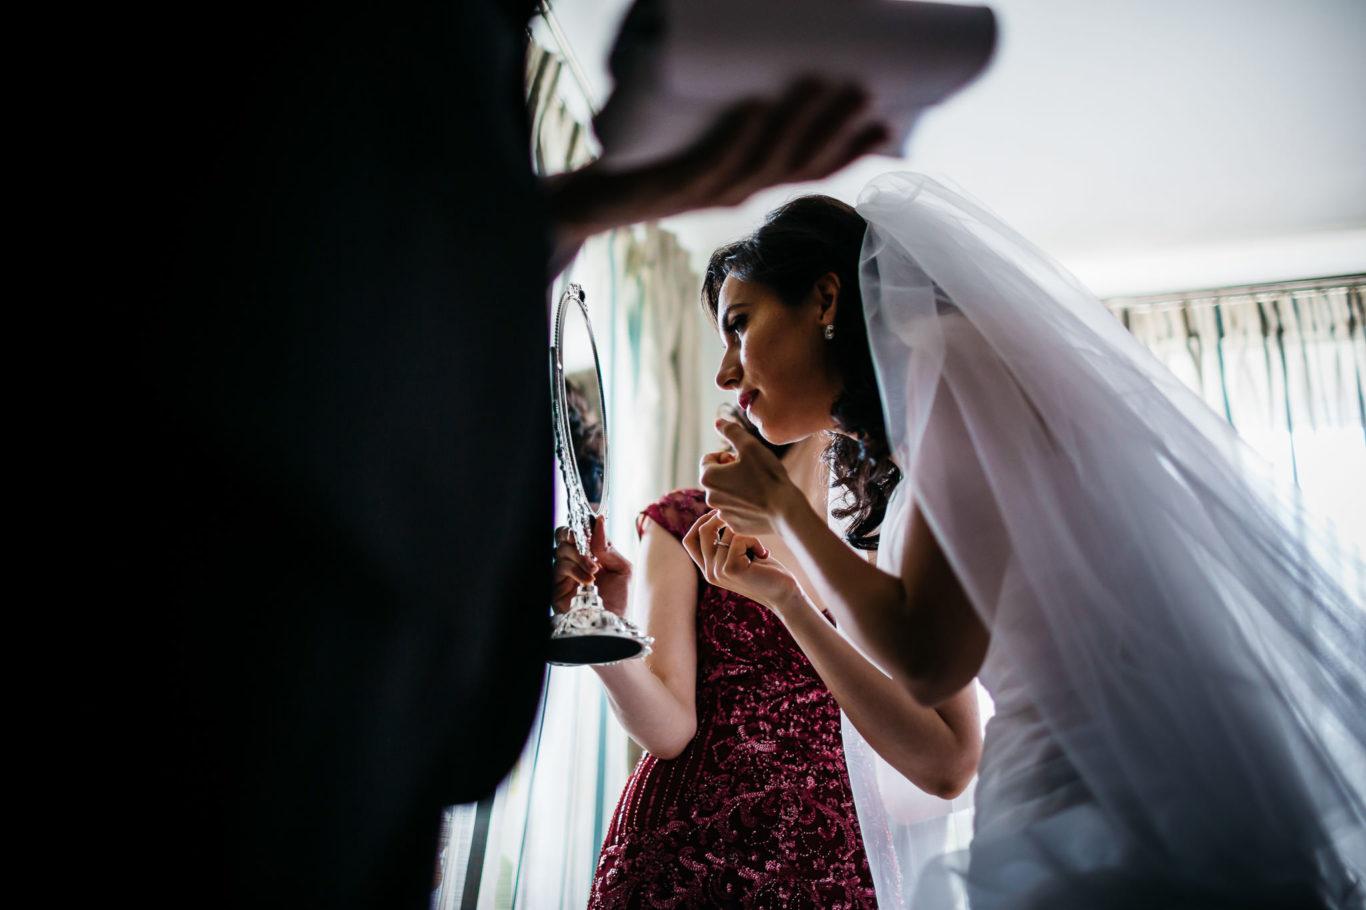 0337-Fotografie-nunta-Simona-Valentin-fotograf-Ciprian-Dumitrescu-CDF_8915